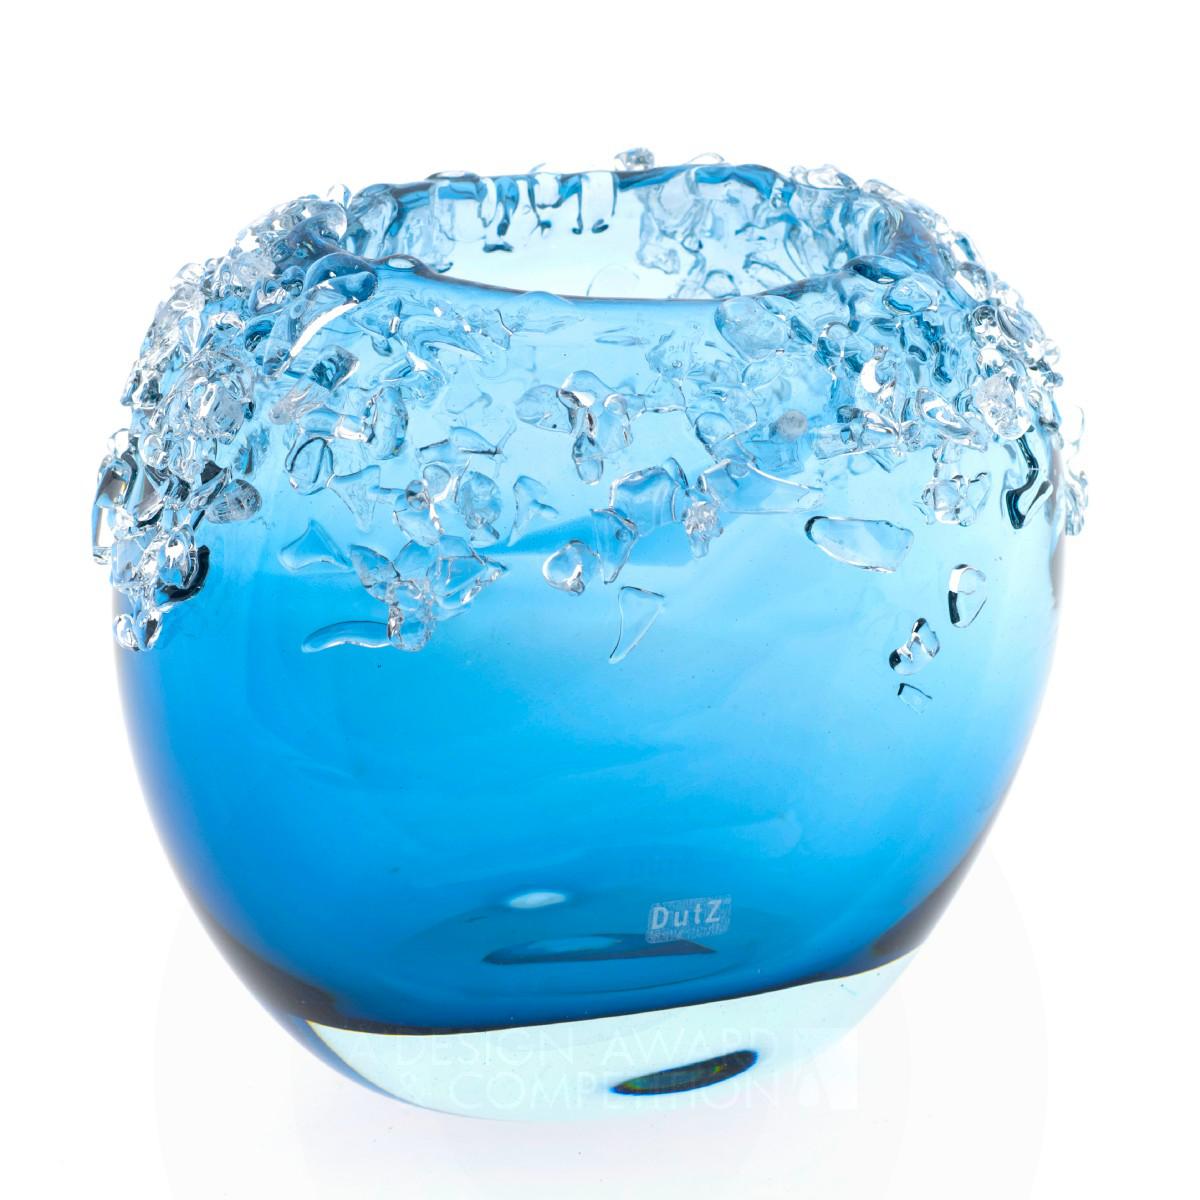 Bumpy Vase